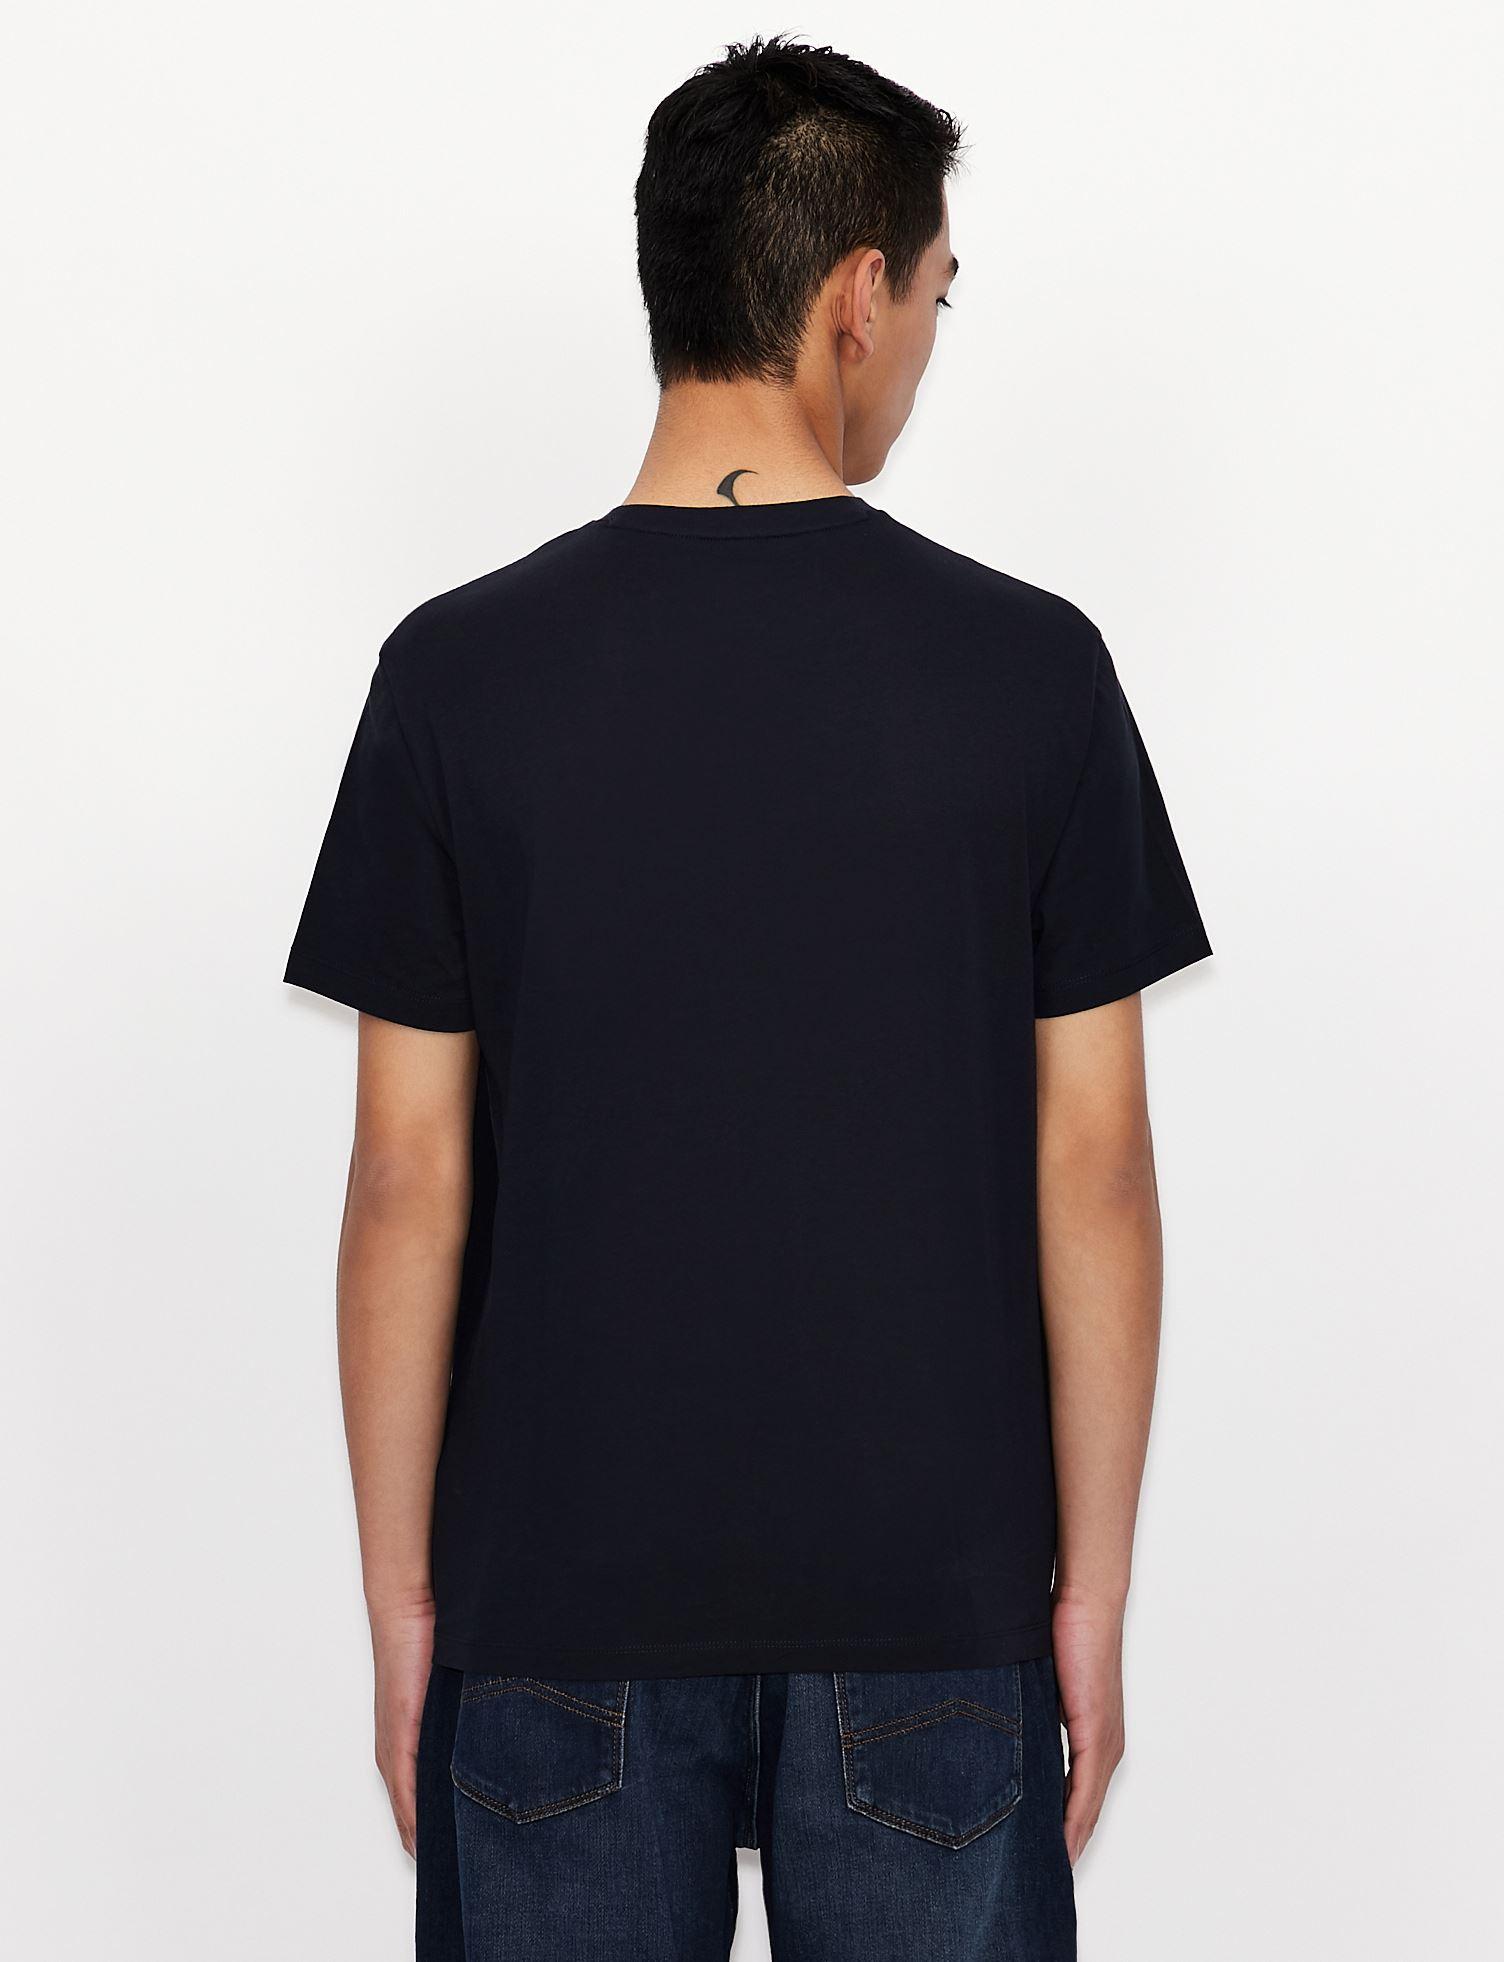 T-shirt Armani Exchange regular fit ARMANI EXCHANGE | T-shirt | 3KZTFU-ZJH4Z1510